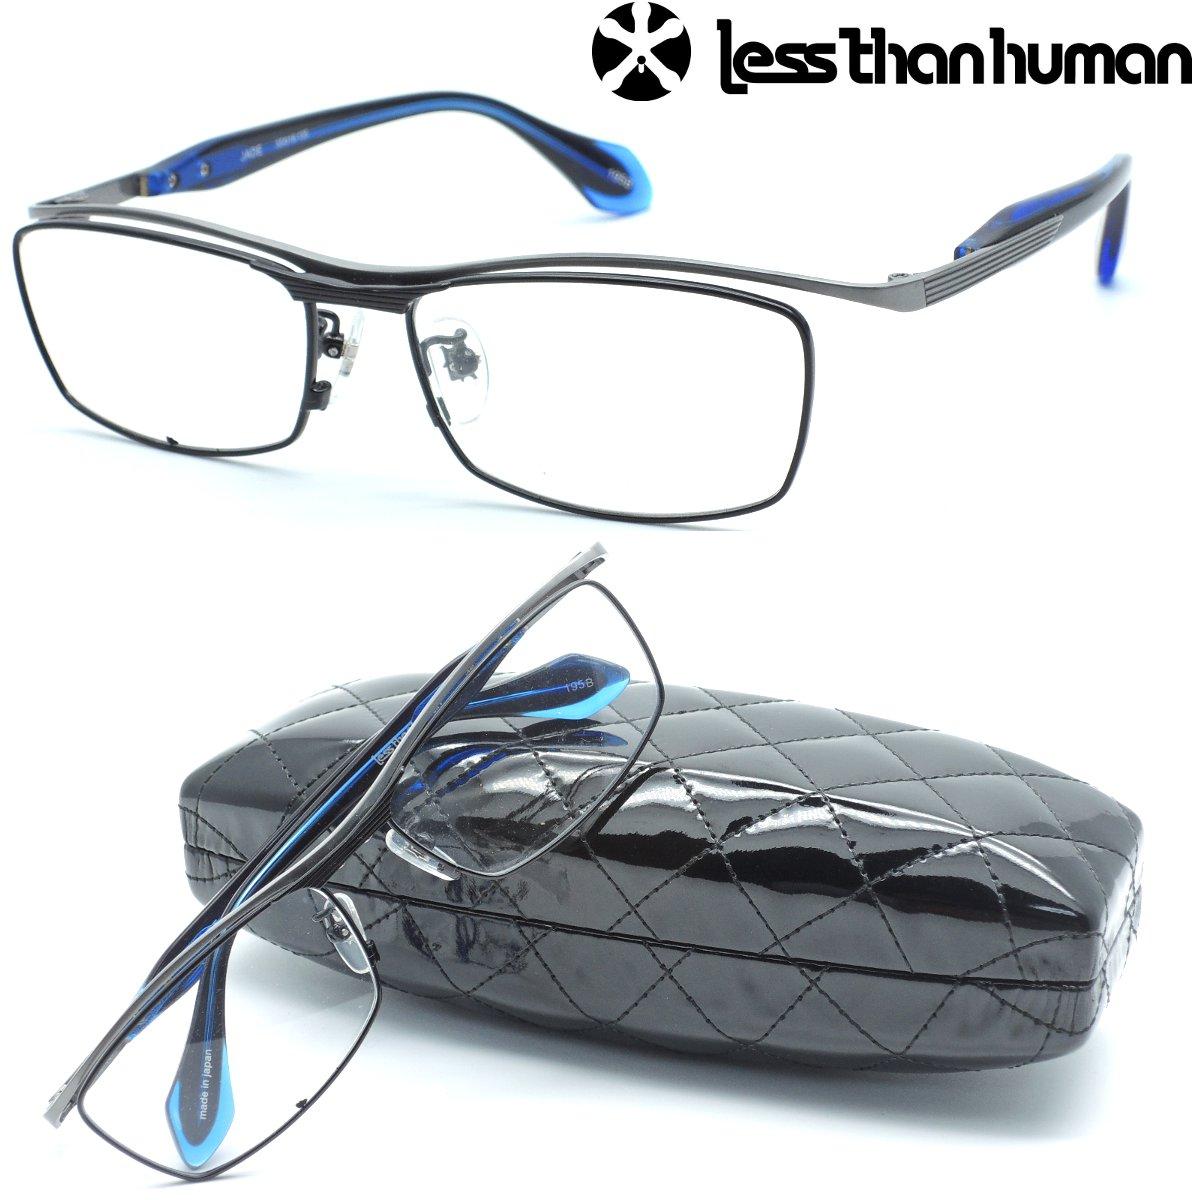 【less than human】レスザンヒューマン JADE col.195B メガネ 度付又は度無レンズセット 【正規品】【店内全品送料無料】